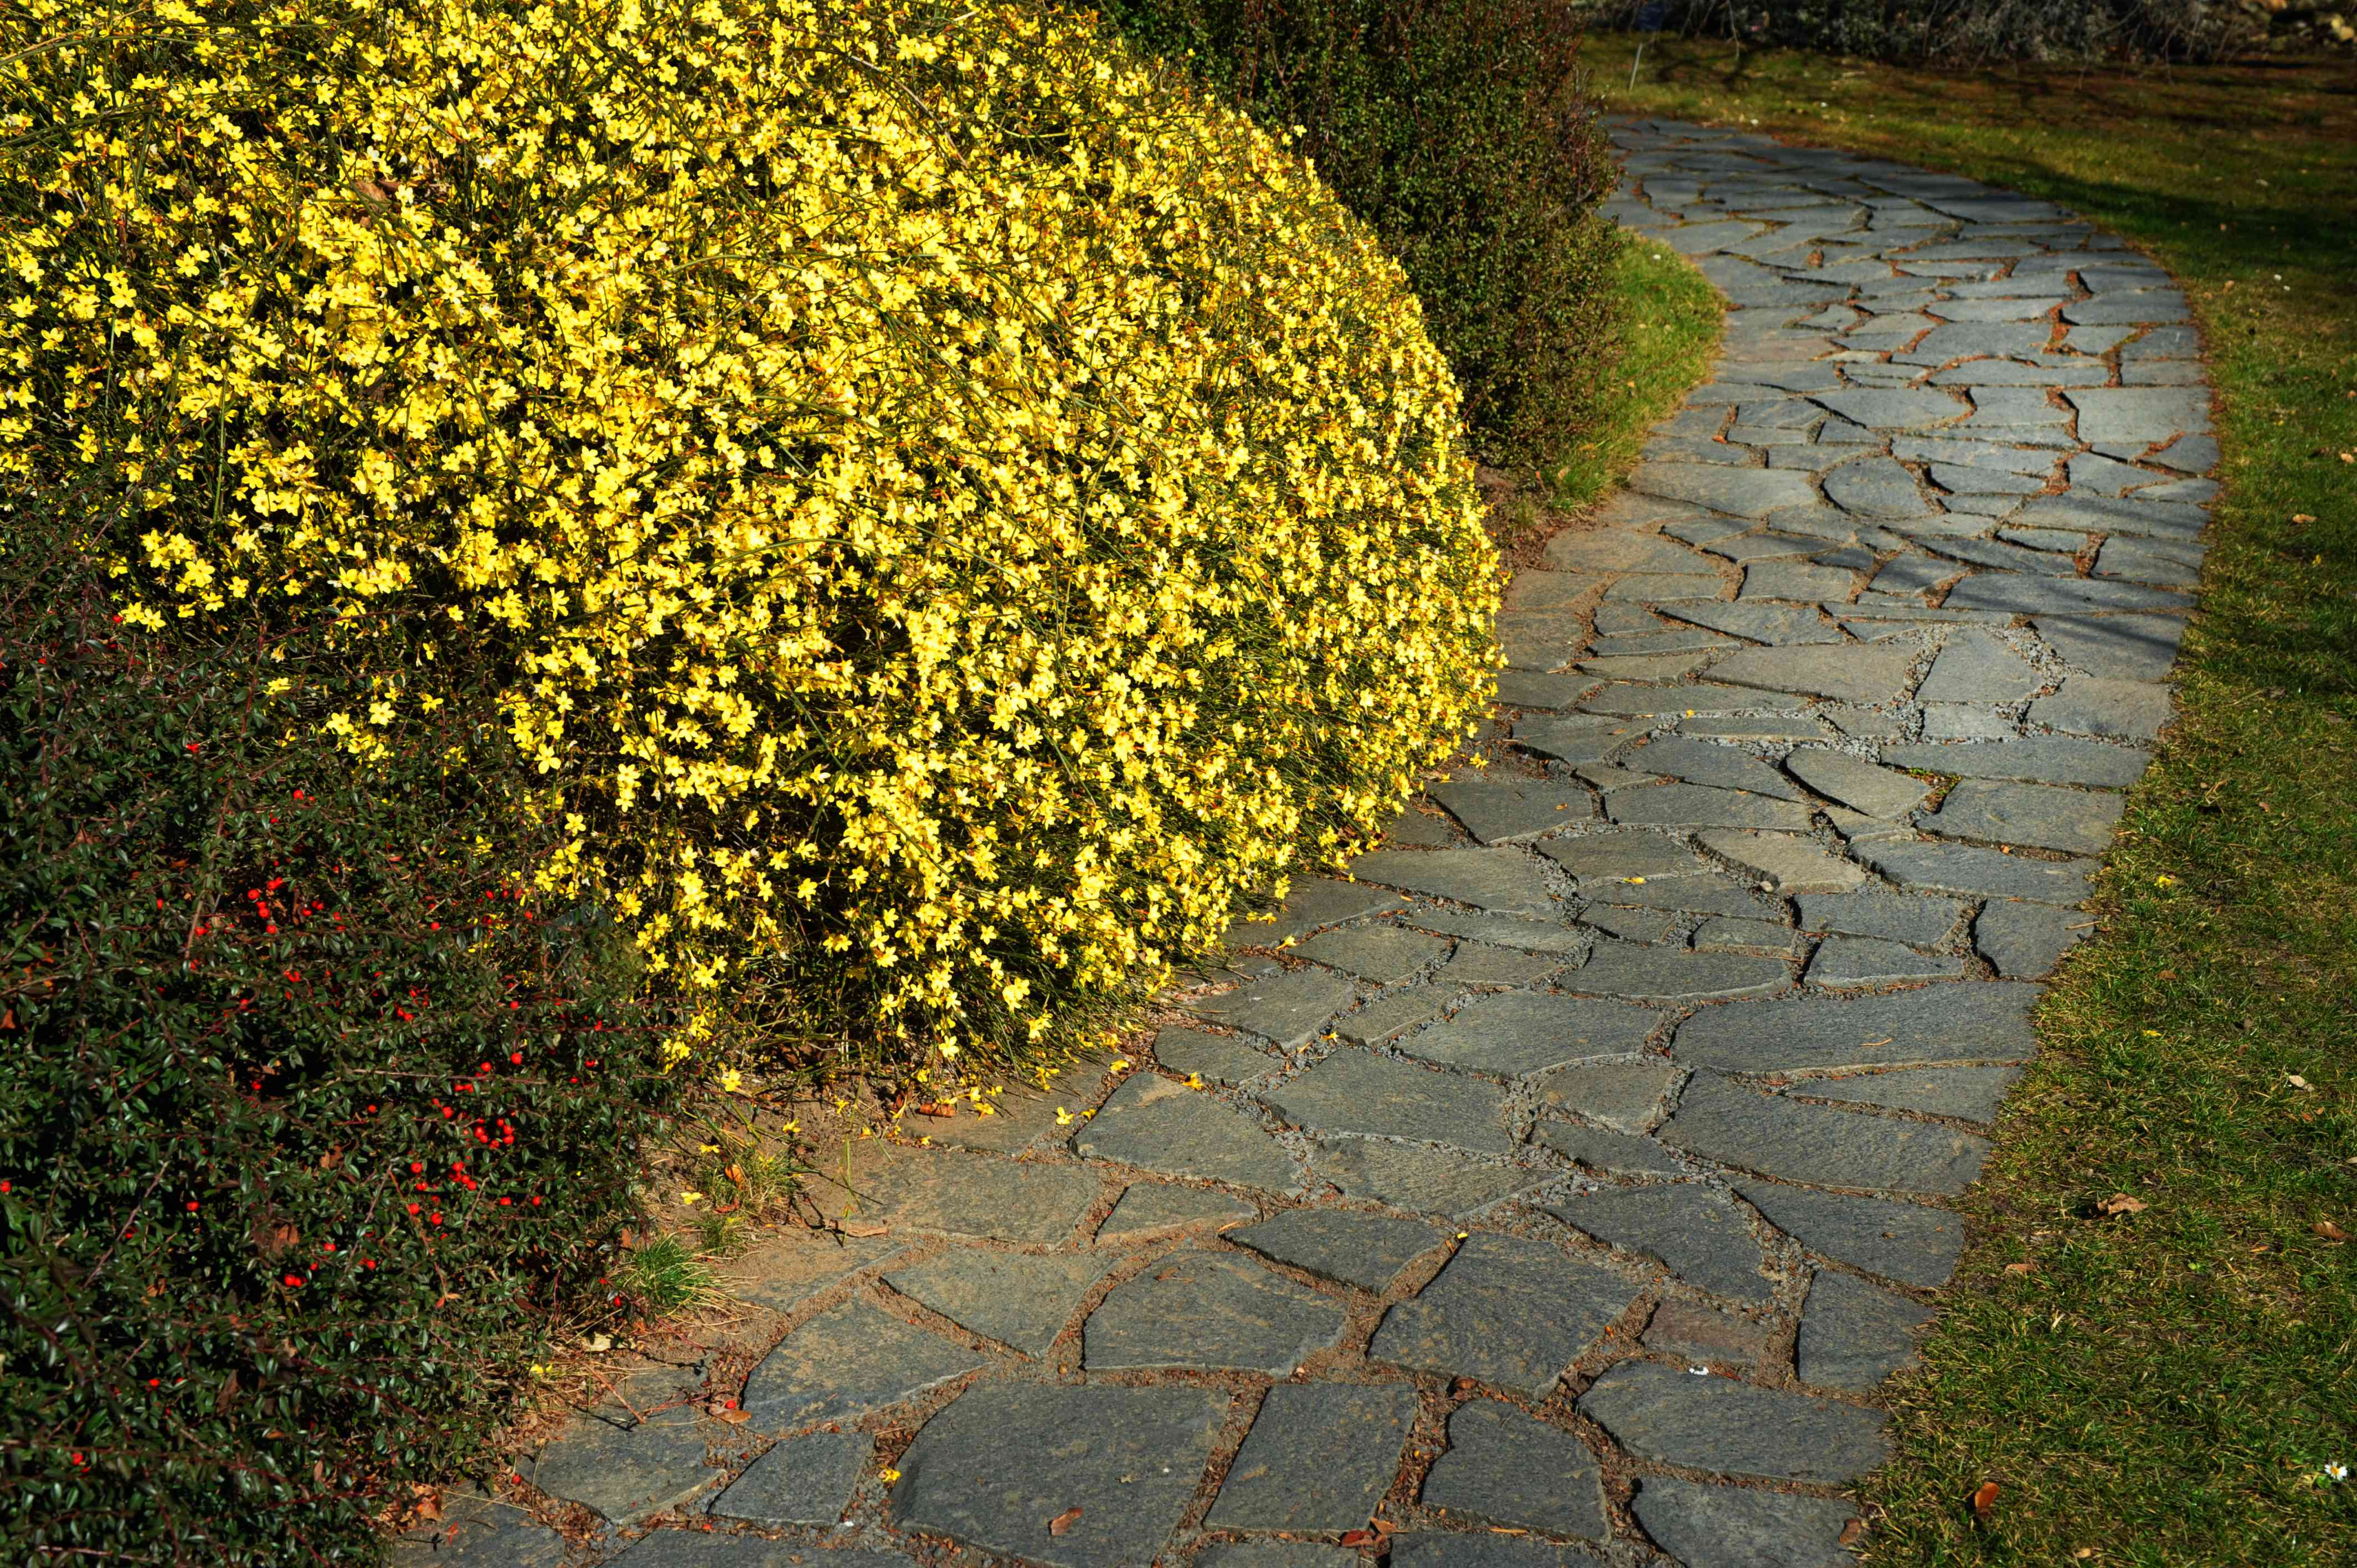 Winter jasmine shrub with yellow flowers alongside garden walkway